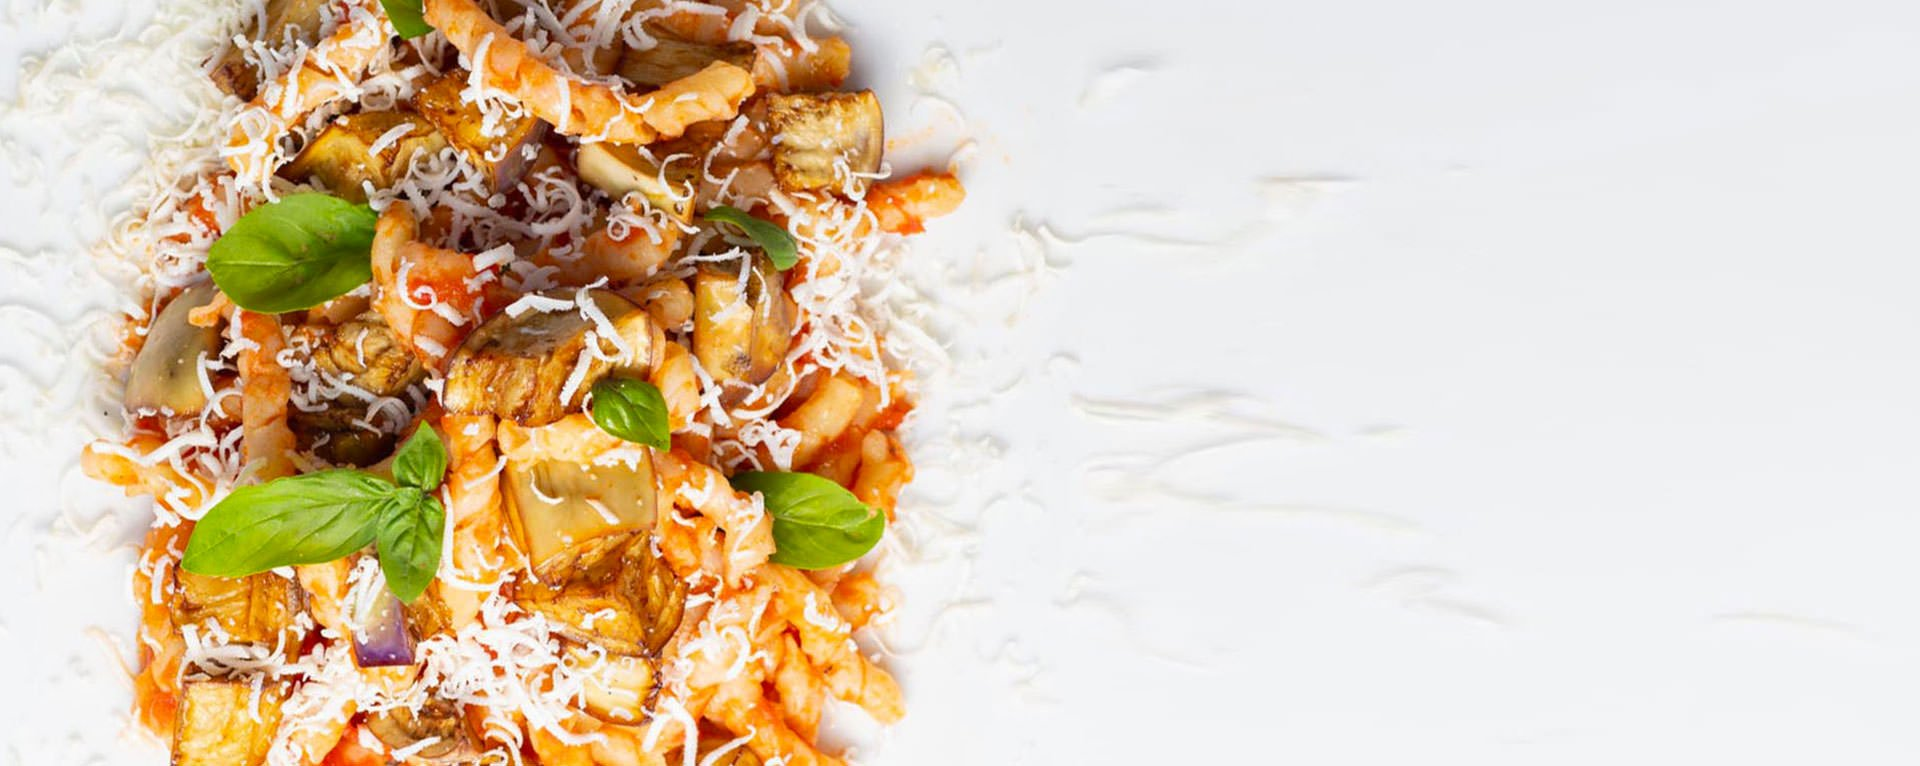 terradelfavonio-menu-pranzo-pasta-01-resize